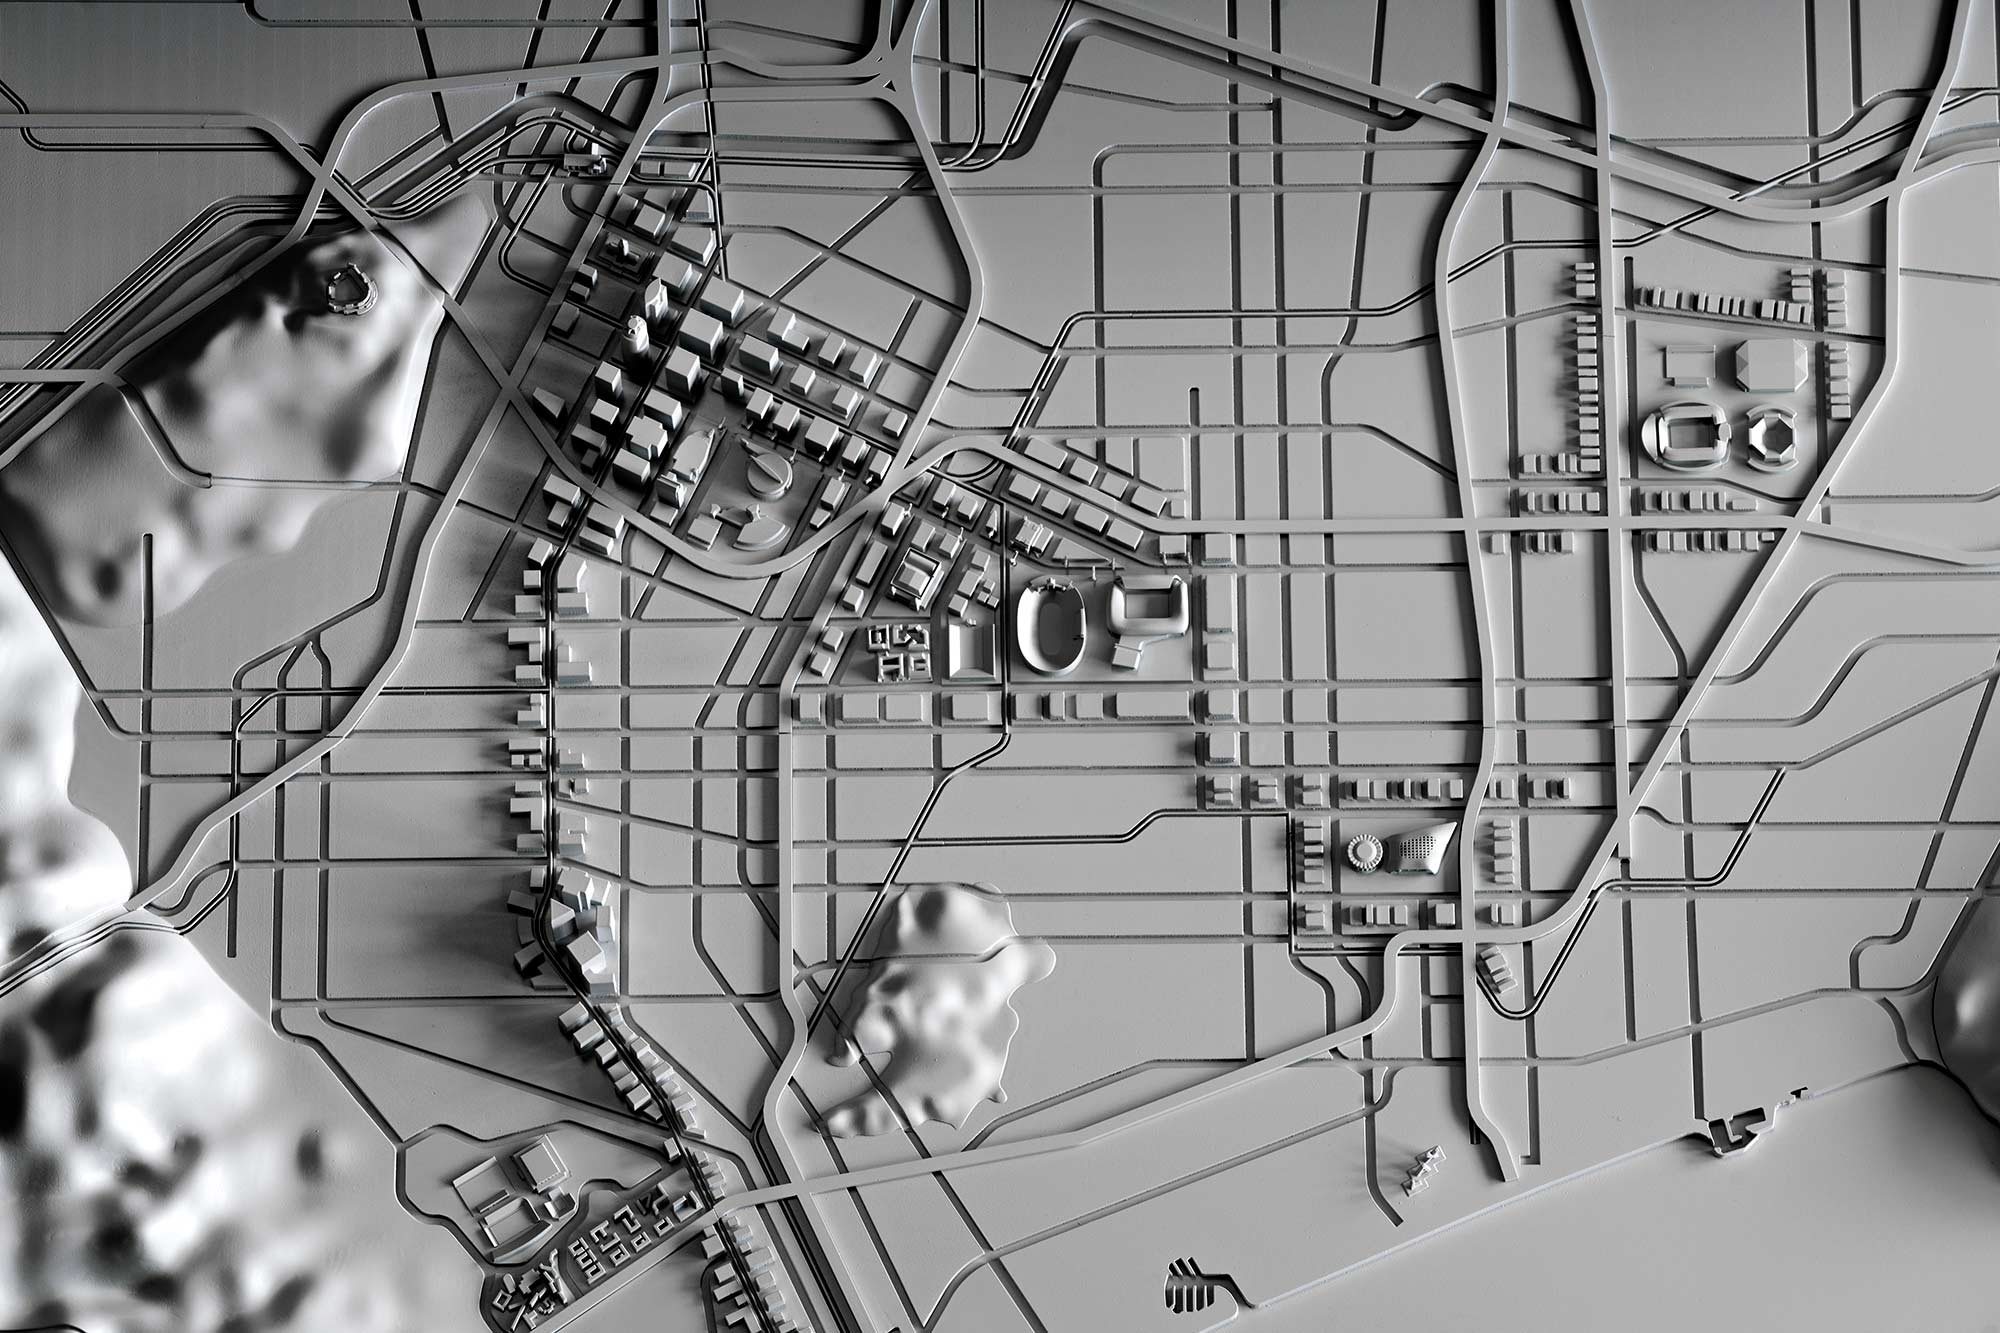 Los-Angeles-2028_-Maquetas-_-EXarchitects_07